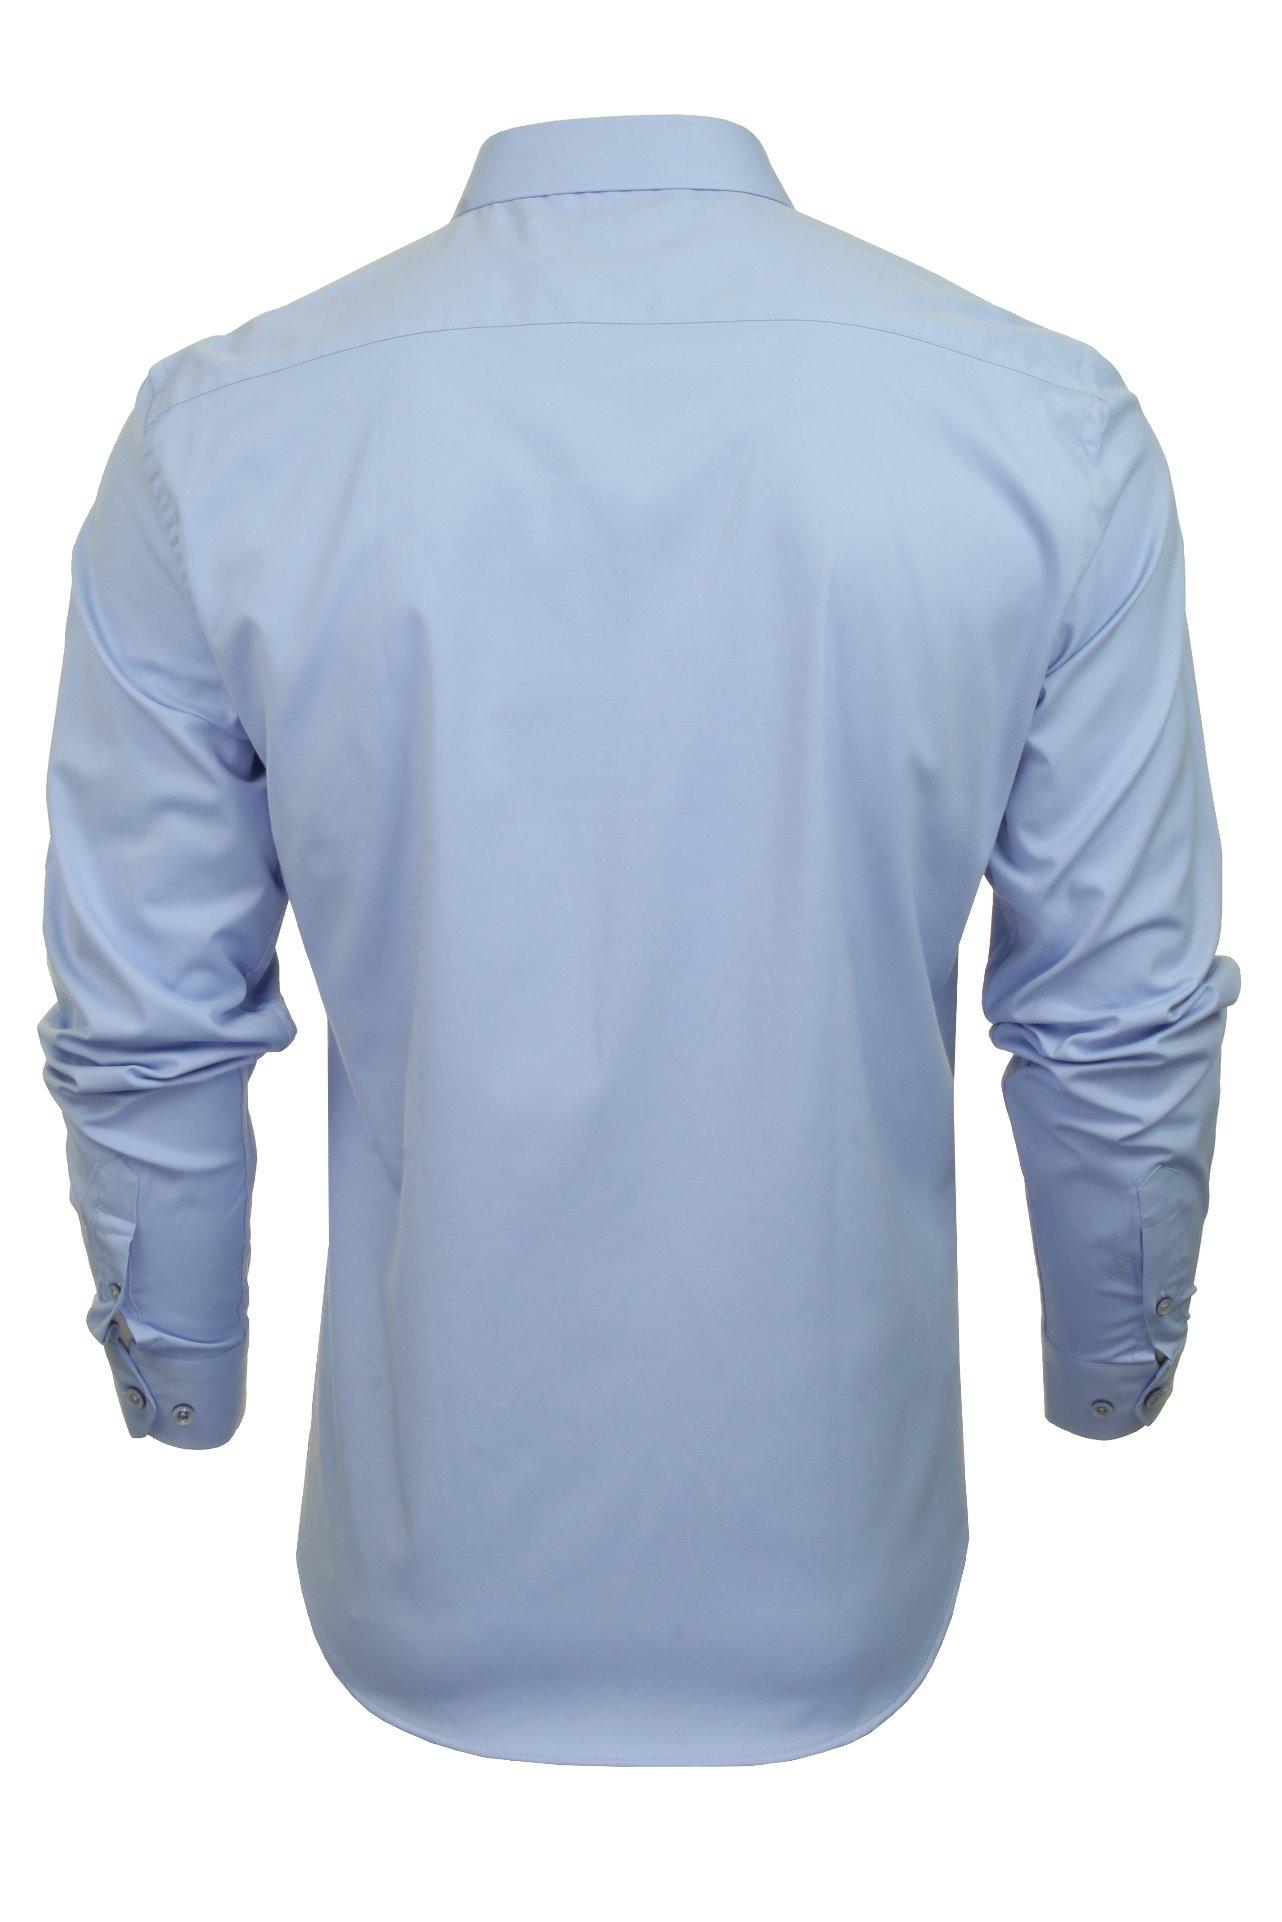 Xact-Mens-Long-Sleeved-Poplin-Stretch-Shirt-Slim-Fit miniatuur 11